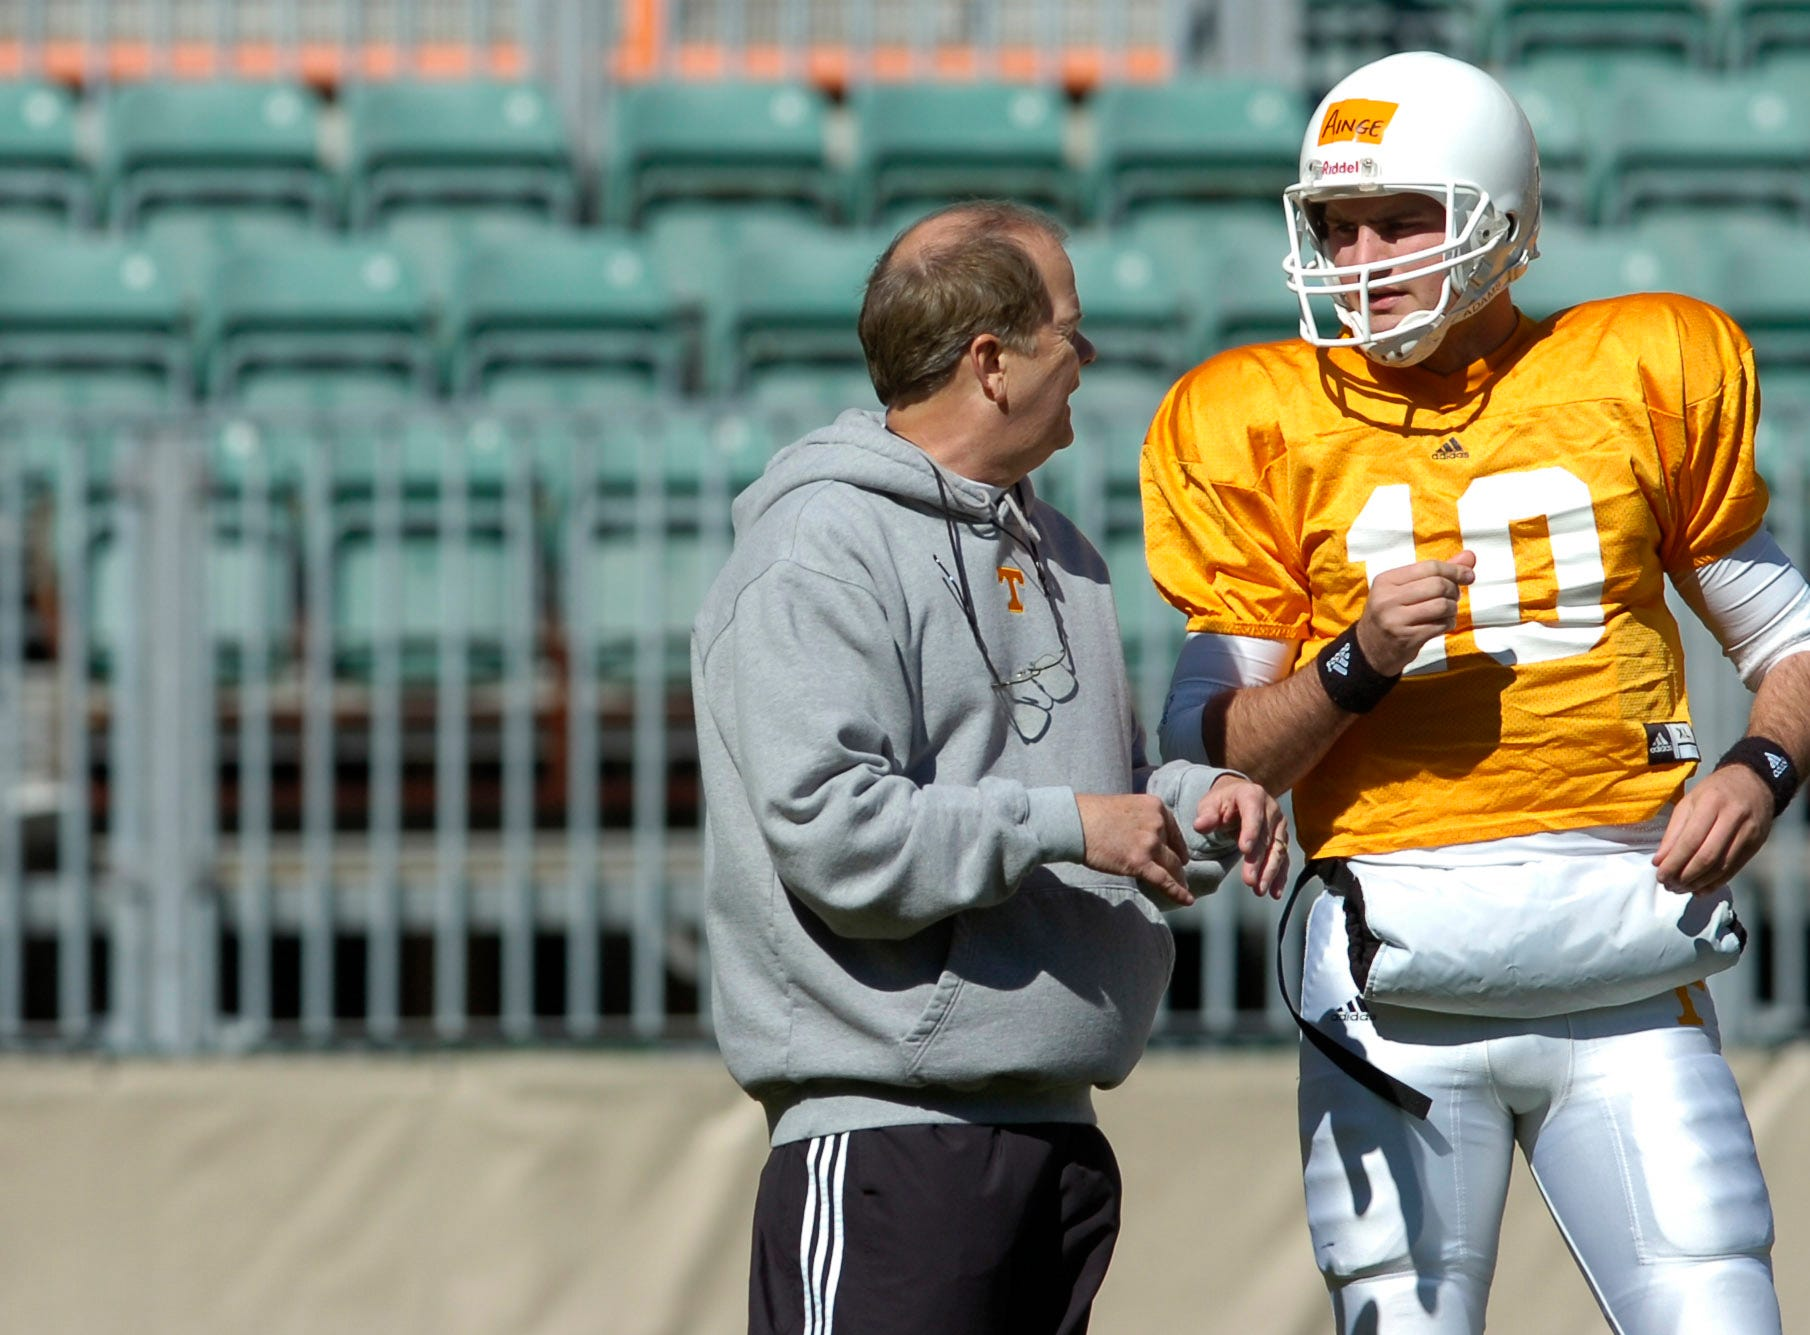 utfootball.ASB#7320.JPG--SPORTS-- UT coach David Cutcliffe talks with quarterback Erik Ainge during a scrimmage at Neyland Stadium on Saturday.